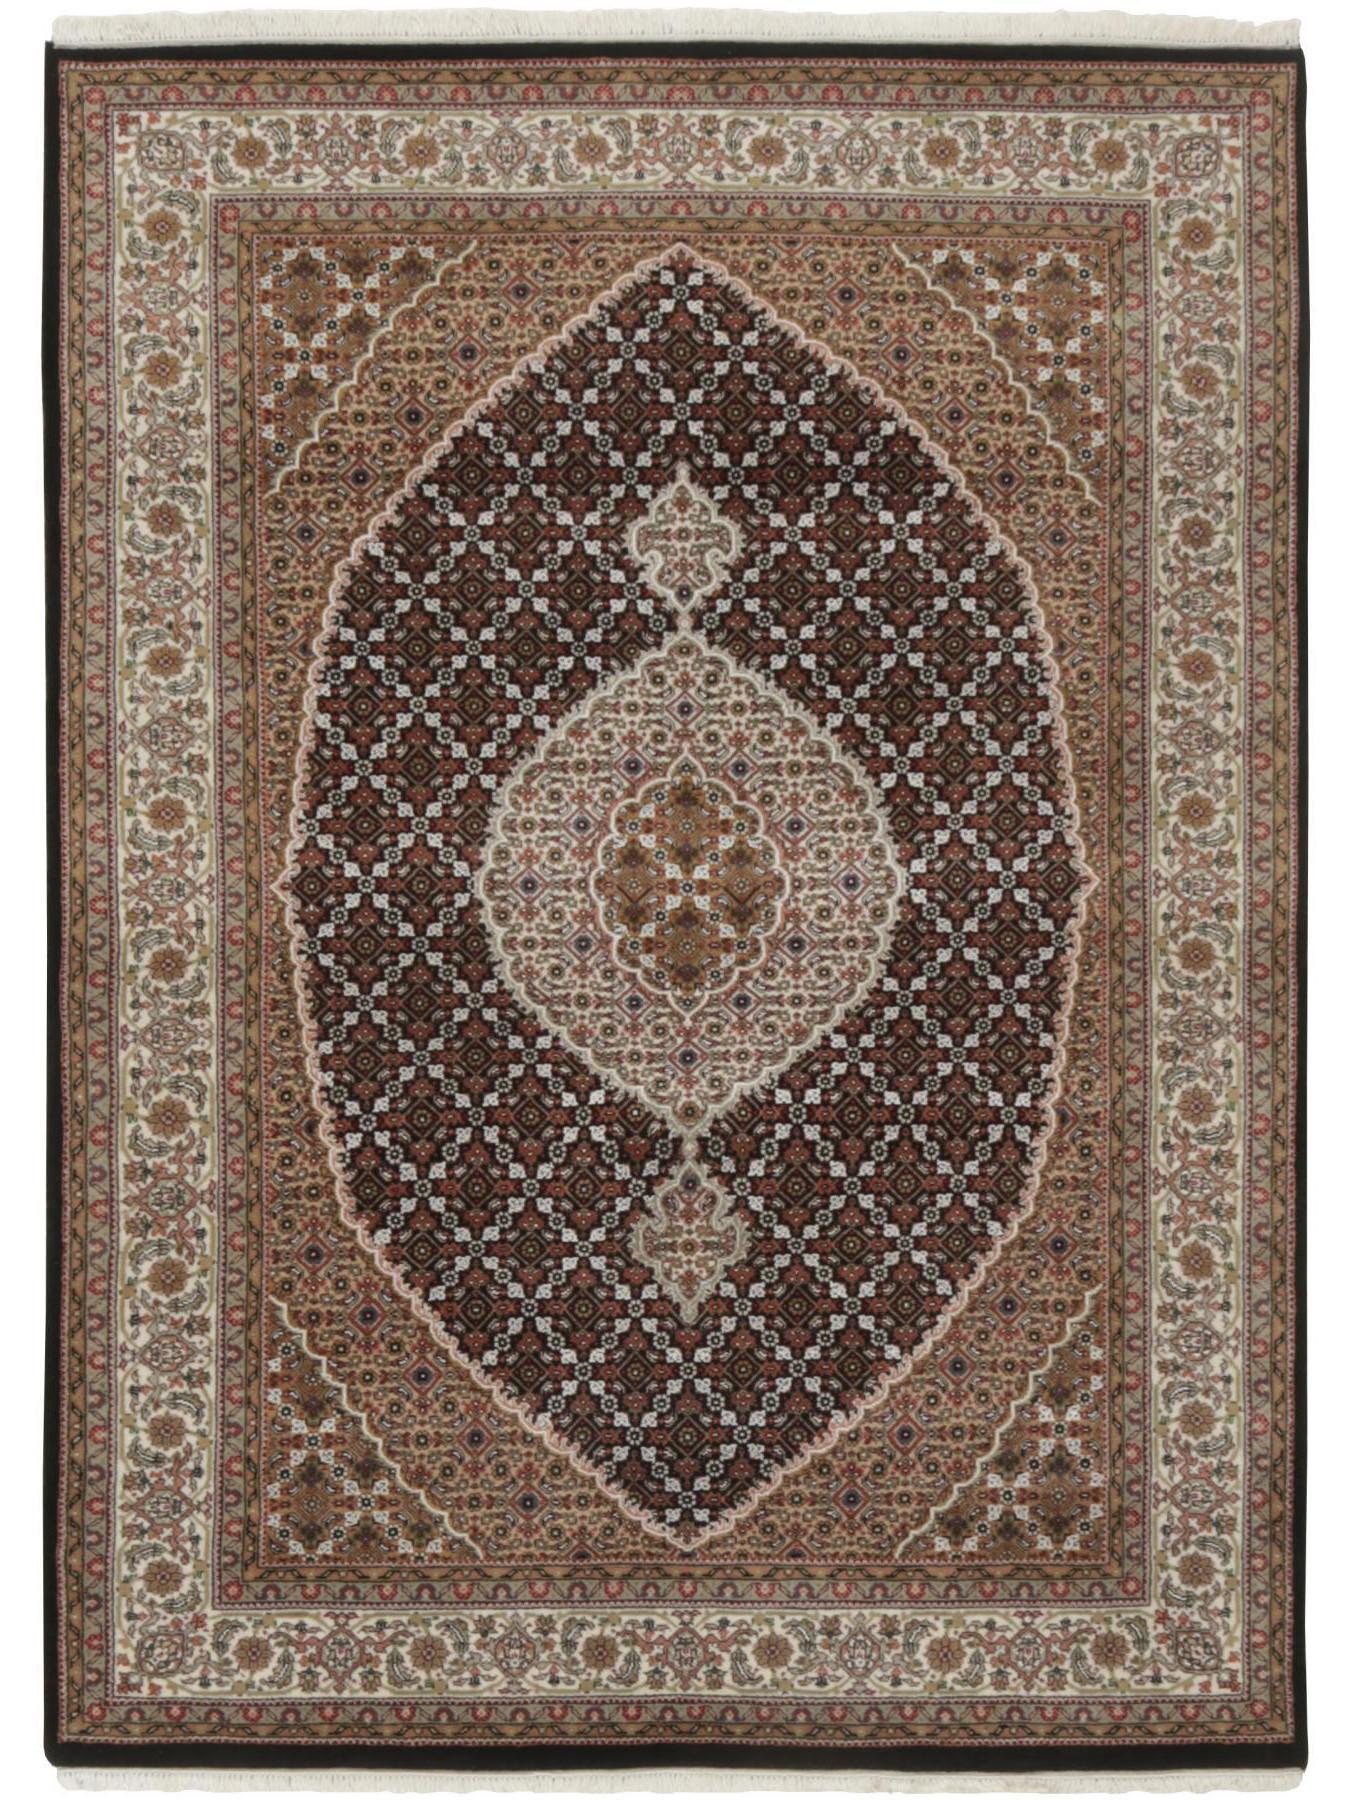 Classic rugs - Tabriz Indi Royal